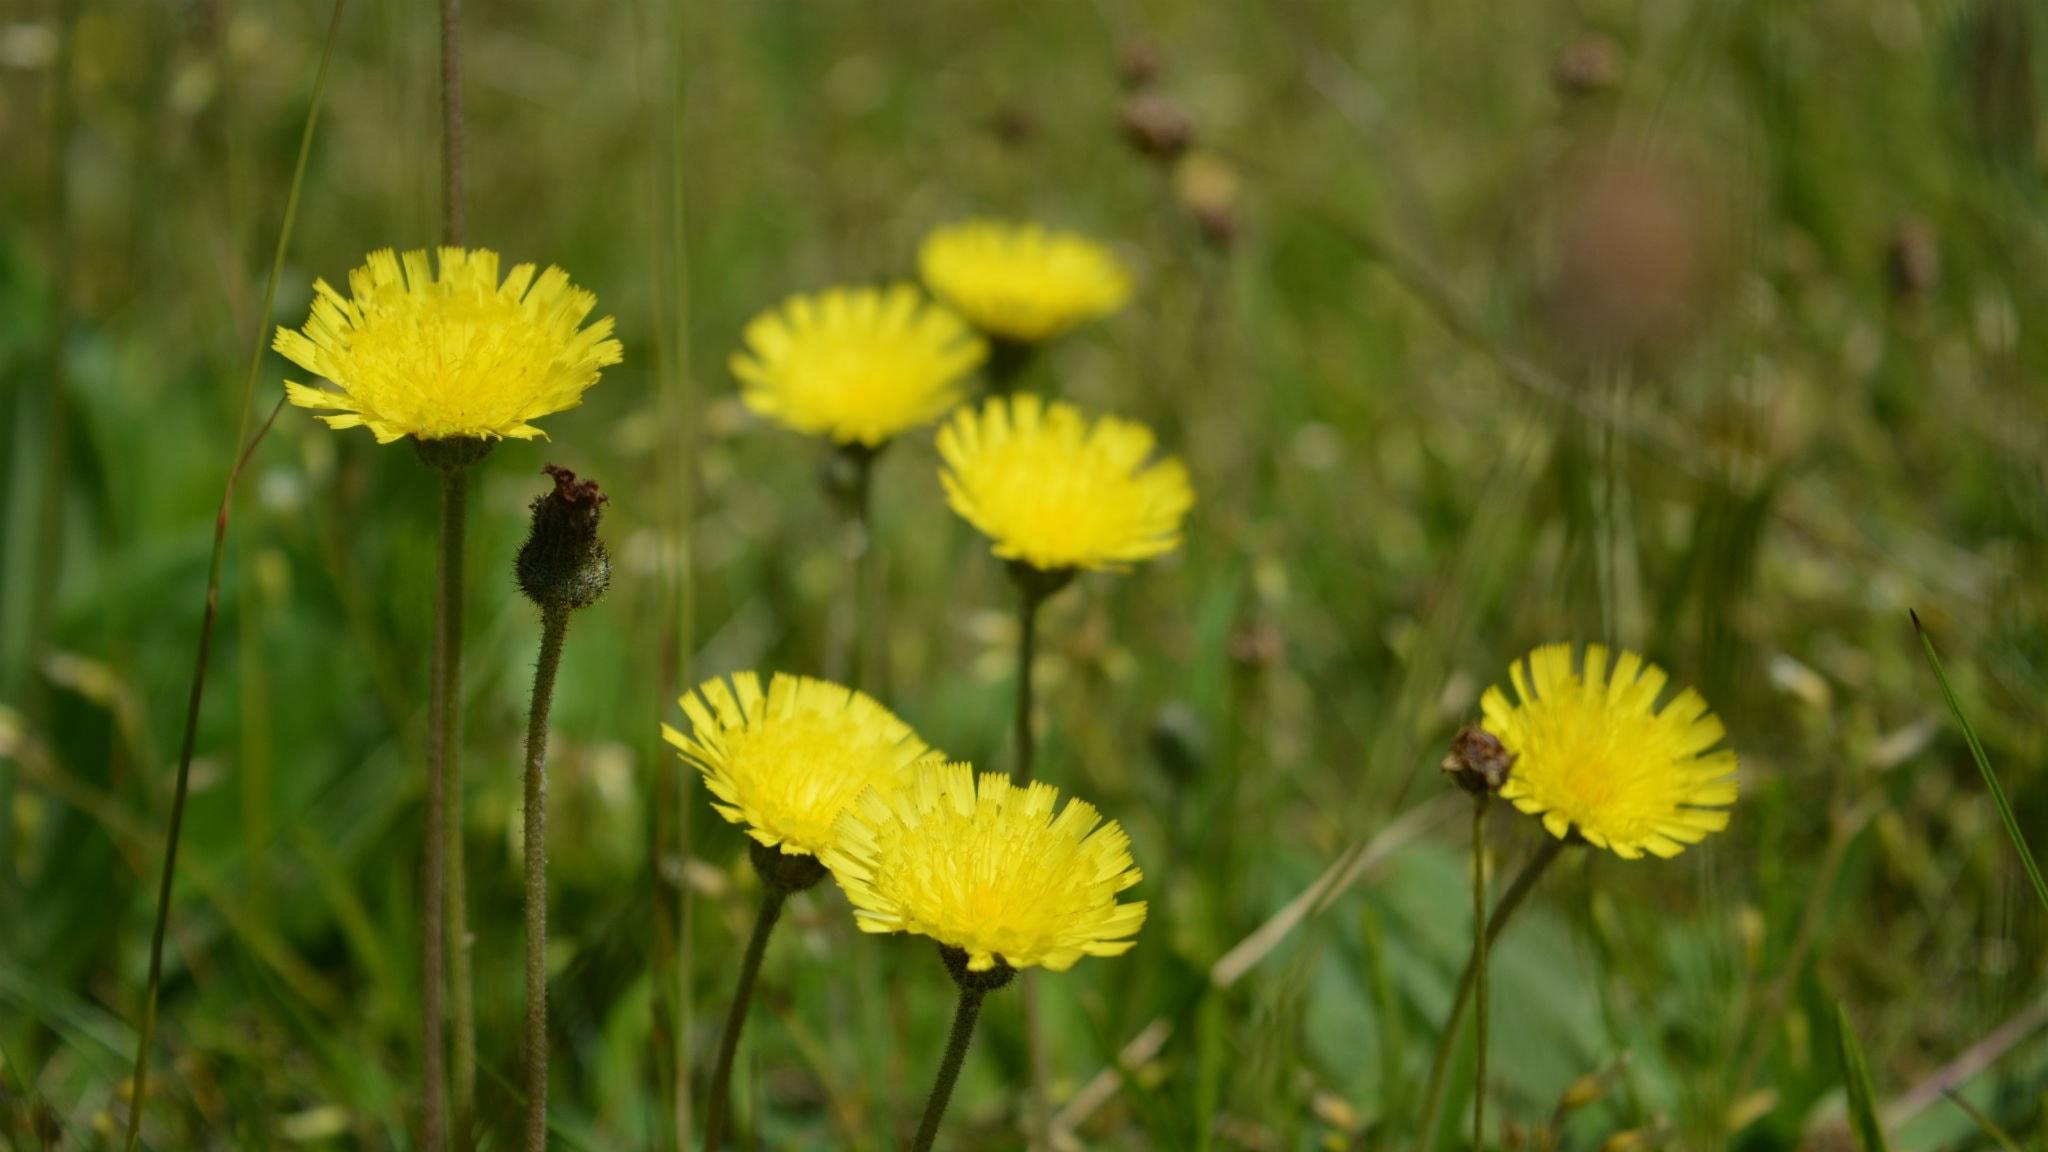 Berits blommor #4: Gråfibbla